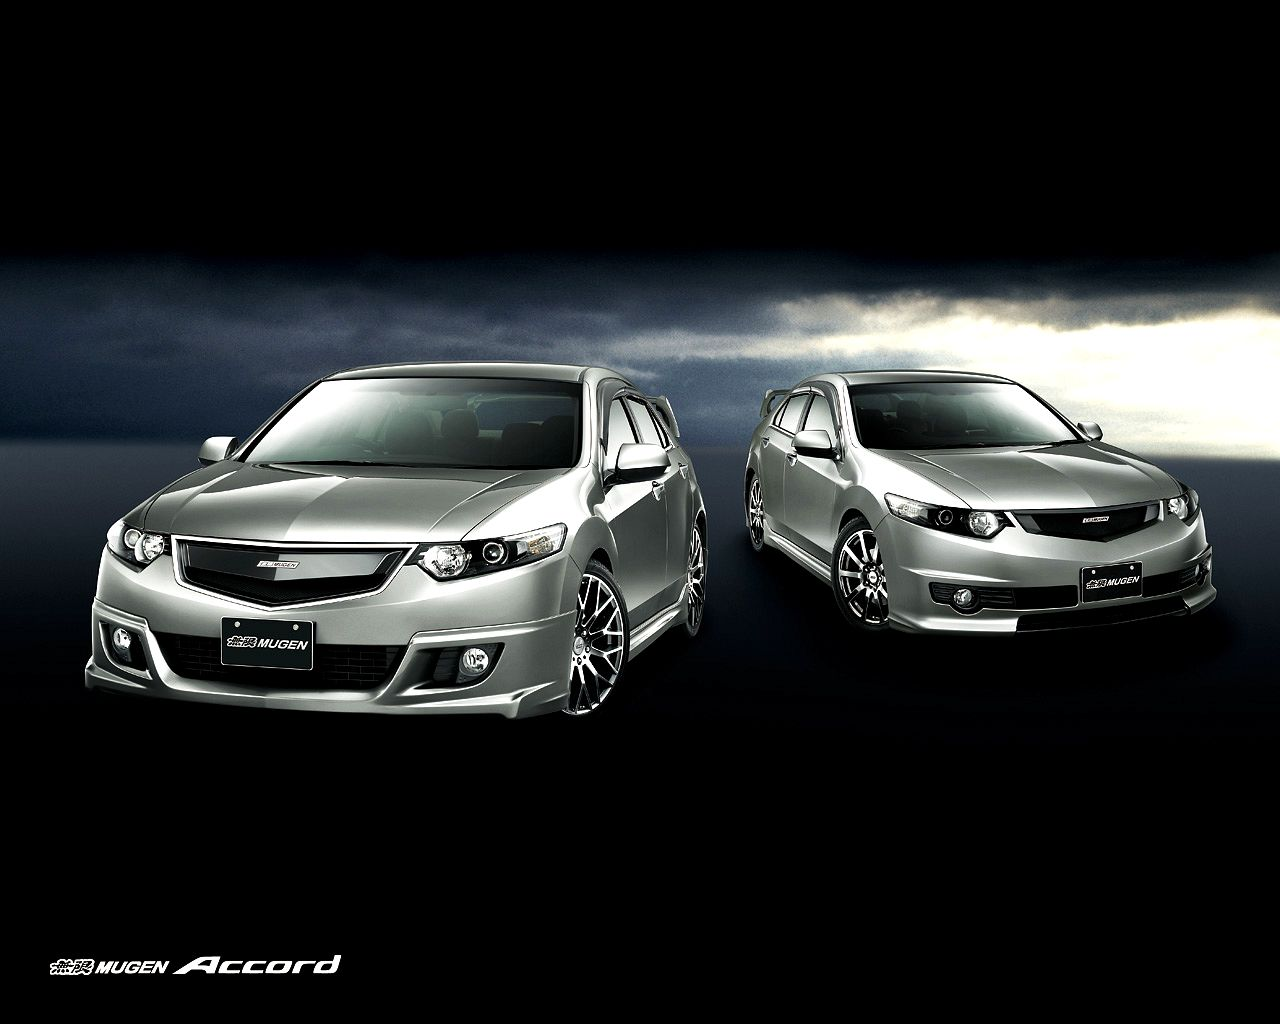 Honda Mugen Accord Car Wallpaper 1280x1024